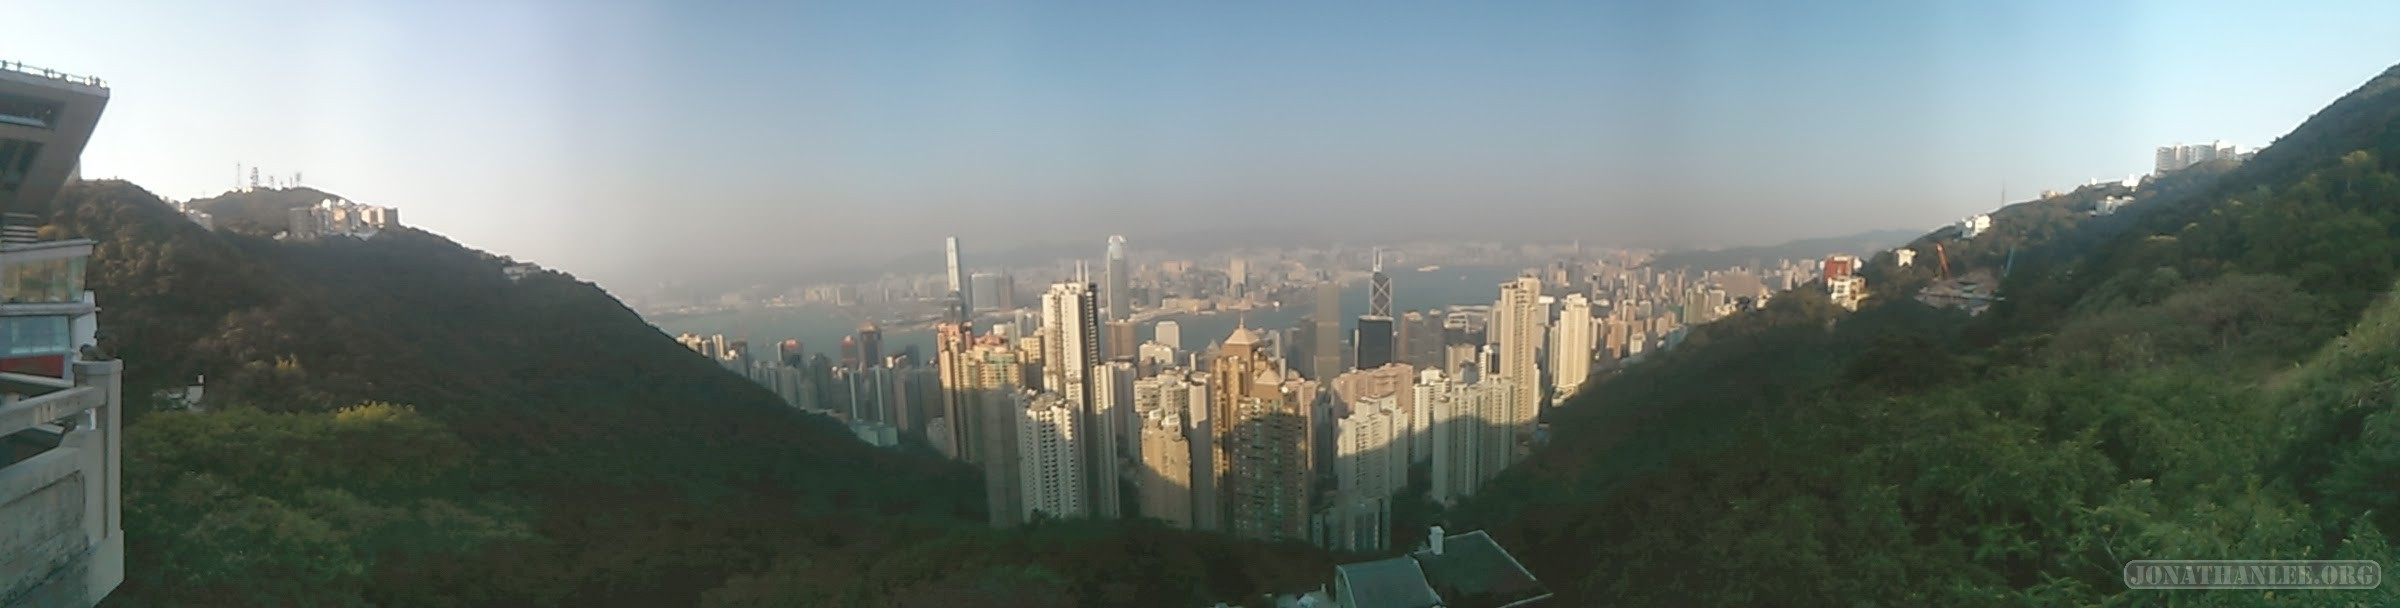 Hong Kong - Victoria peak panorama 1